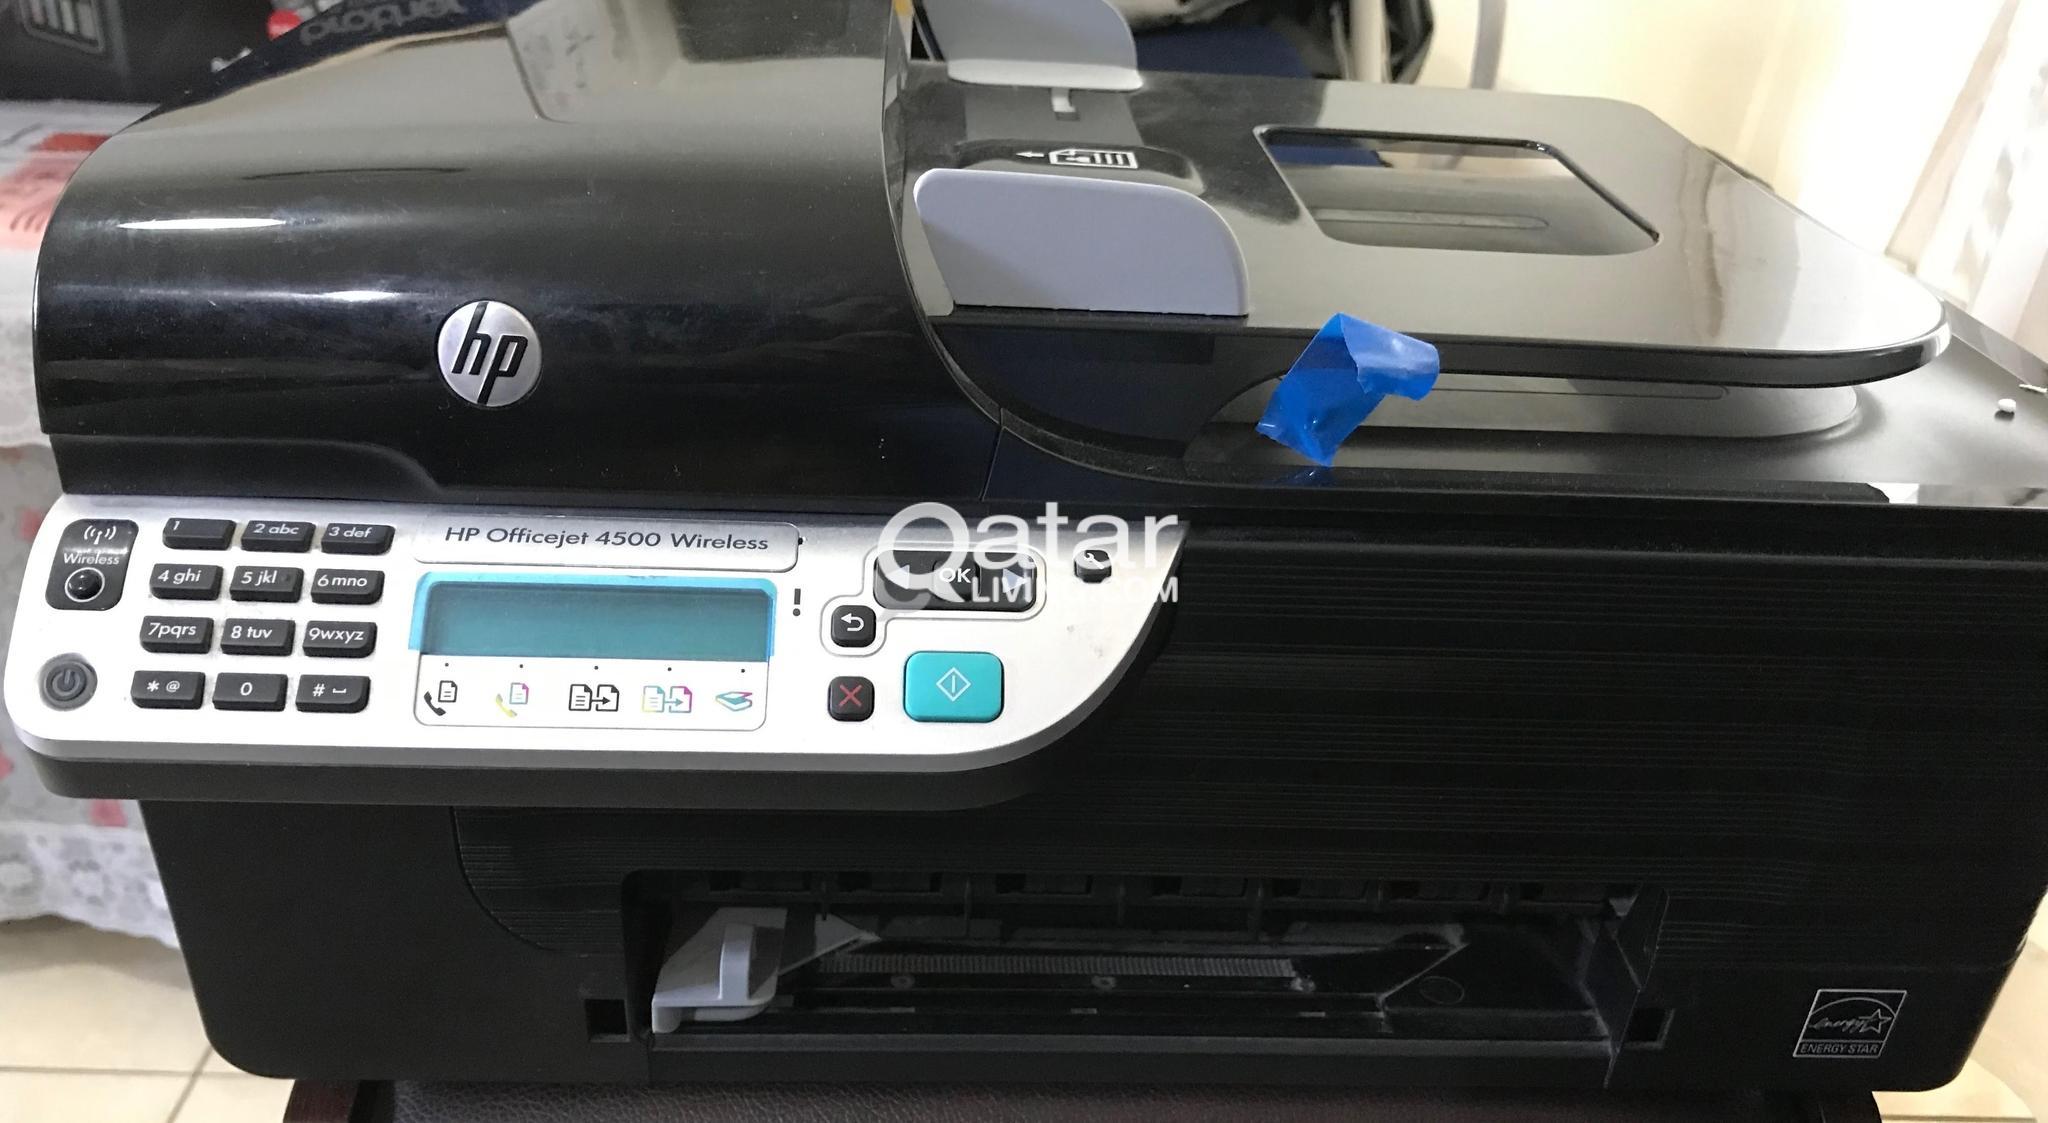 HP 4500 SERIES WIRELESS PRINTER | Qatar Living